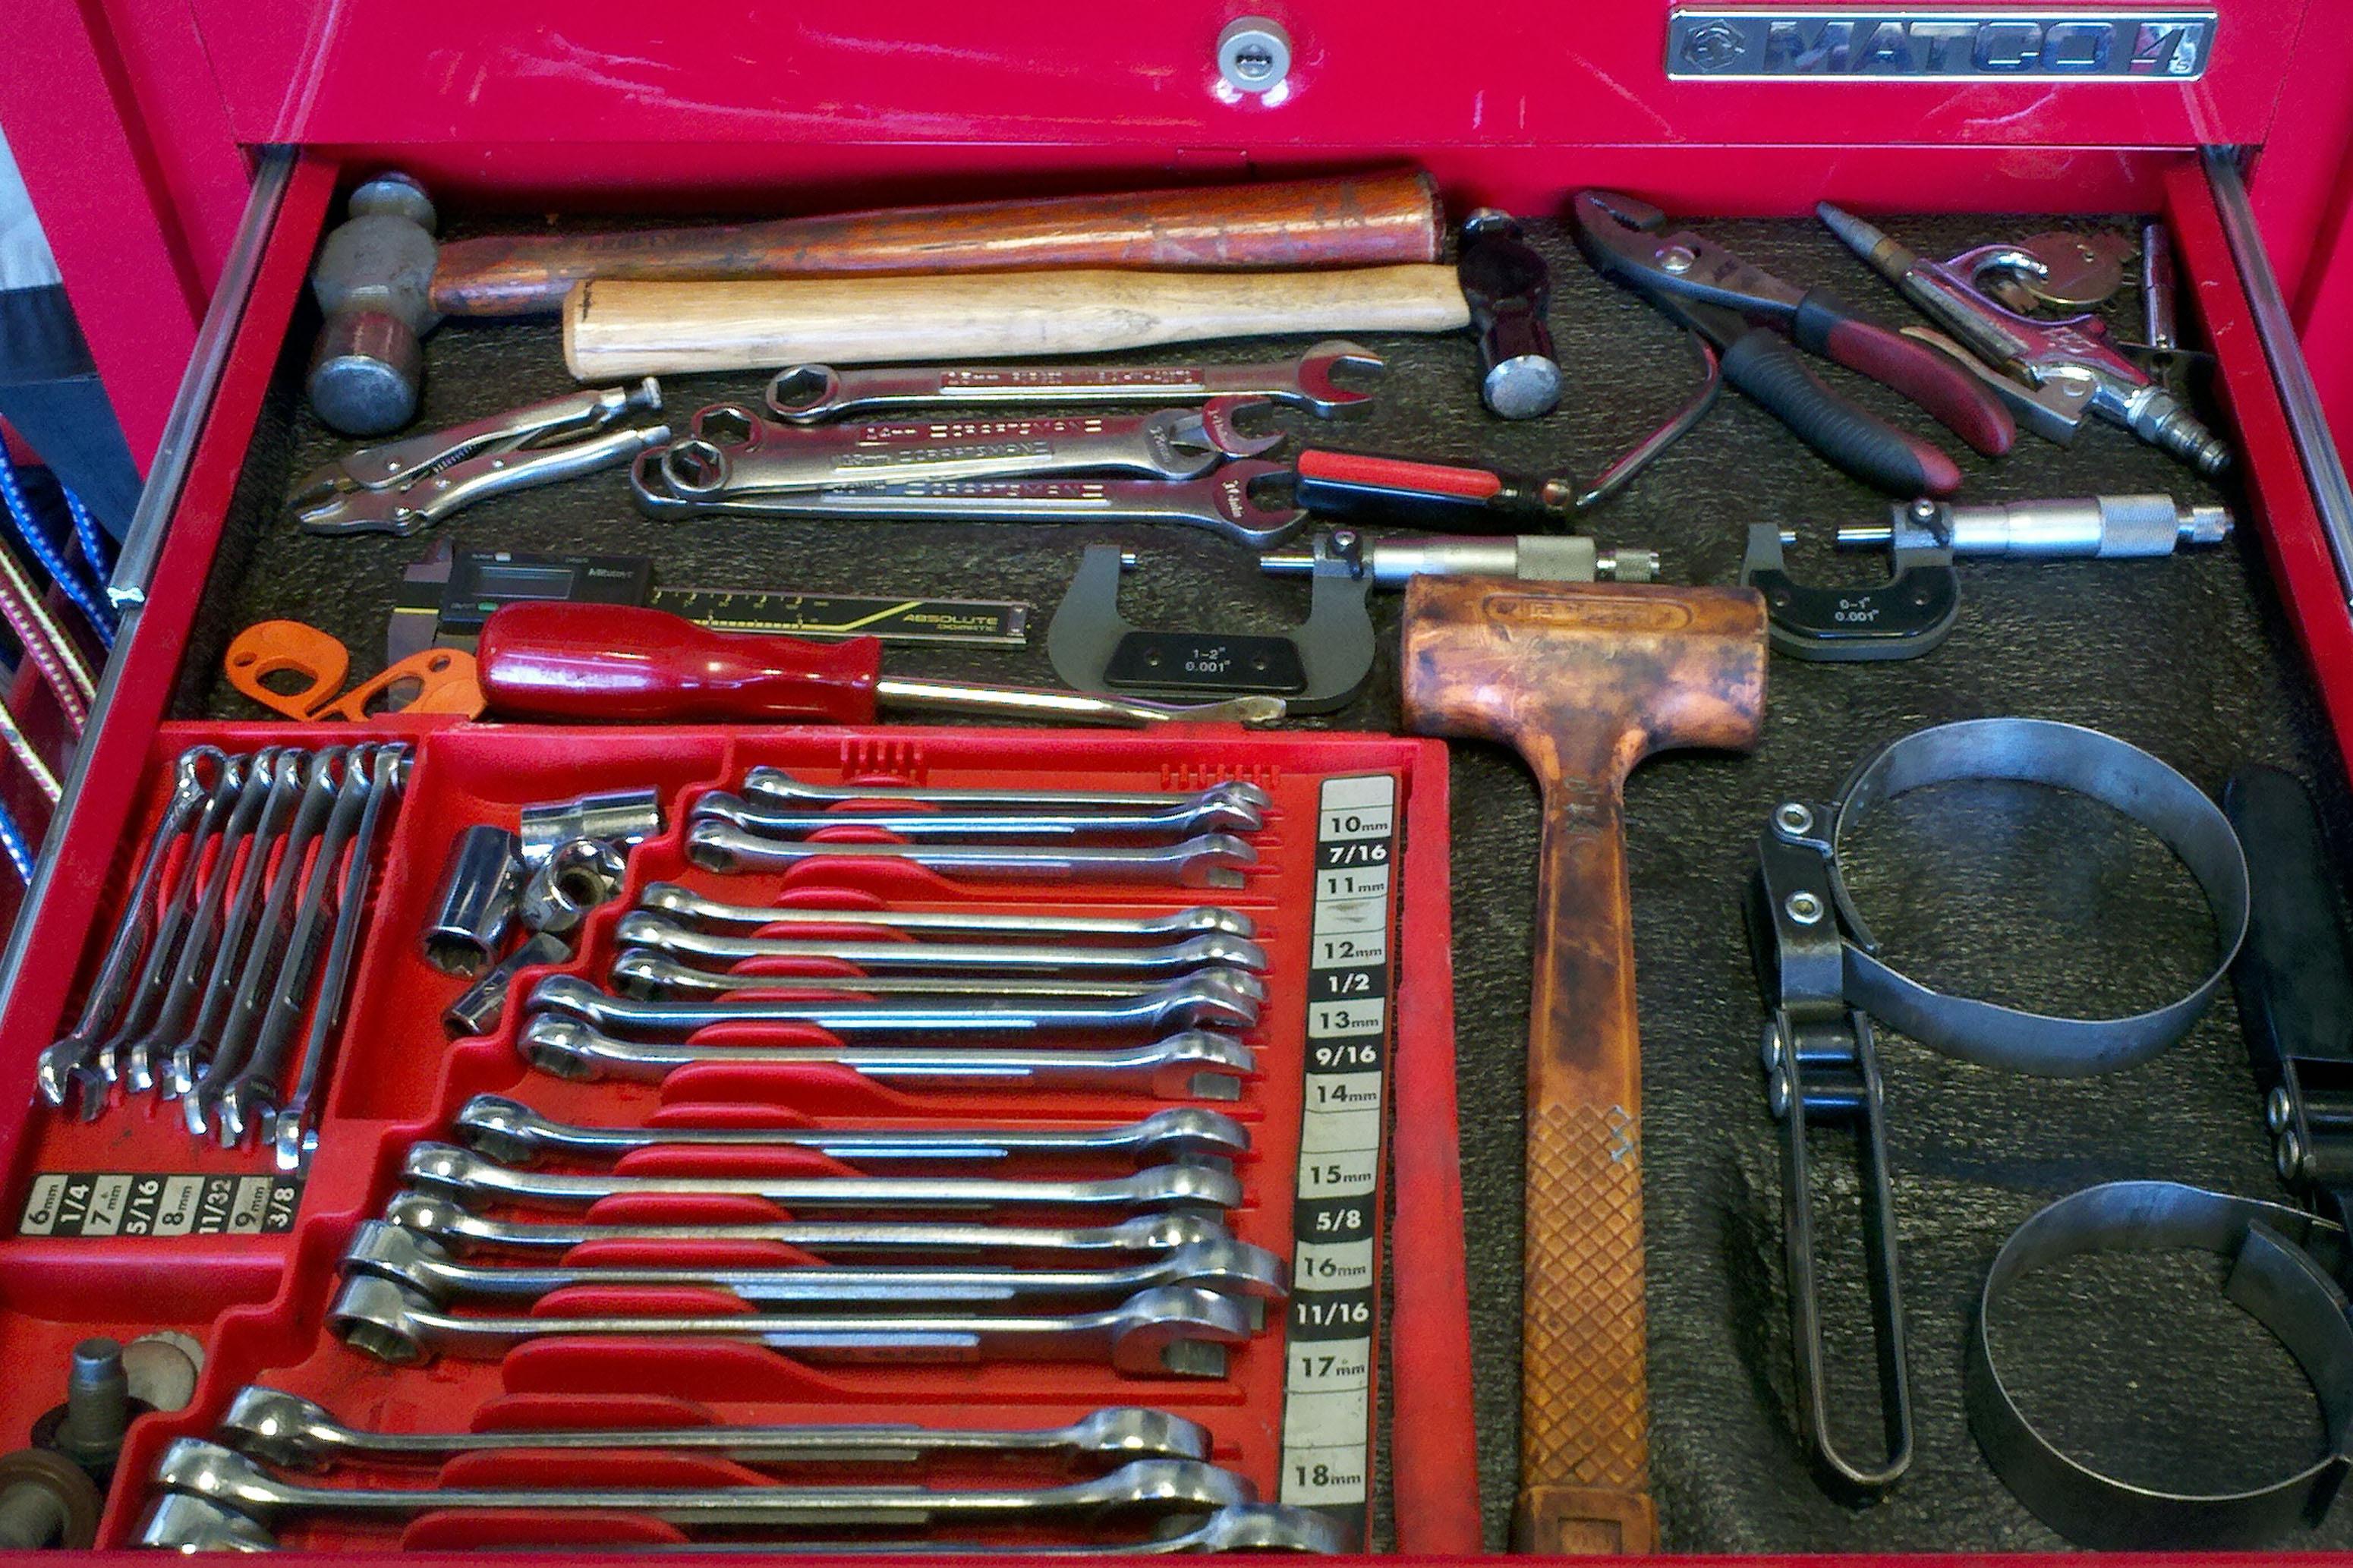 Mechanic Organize Your Tools